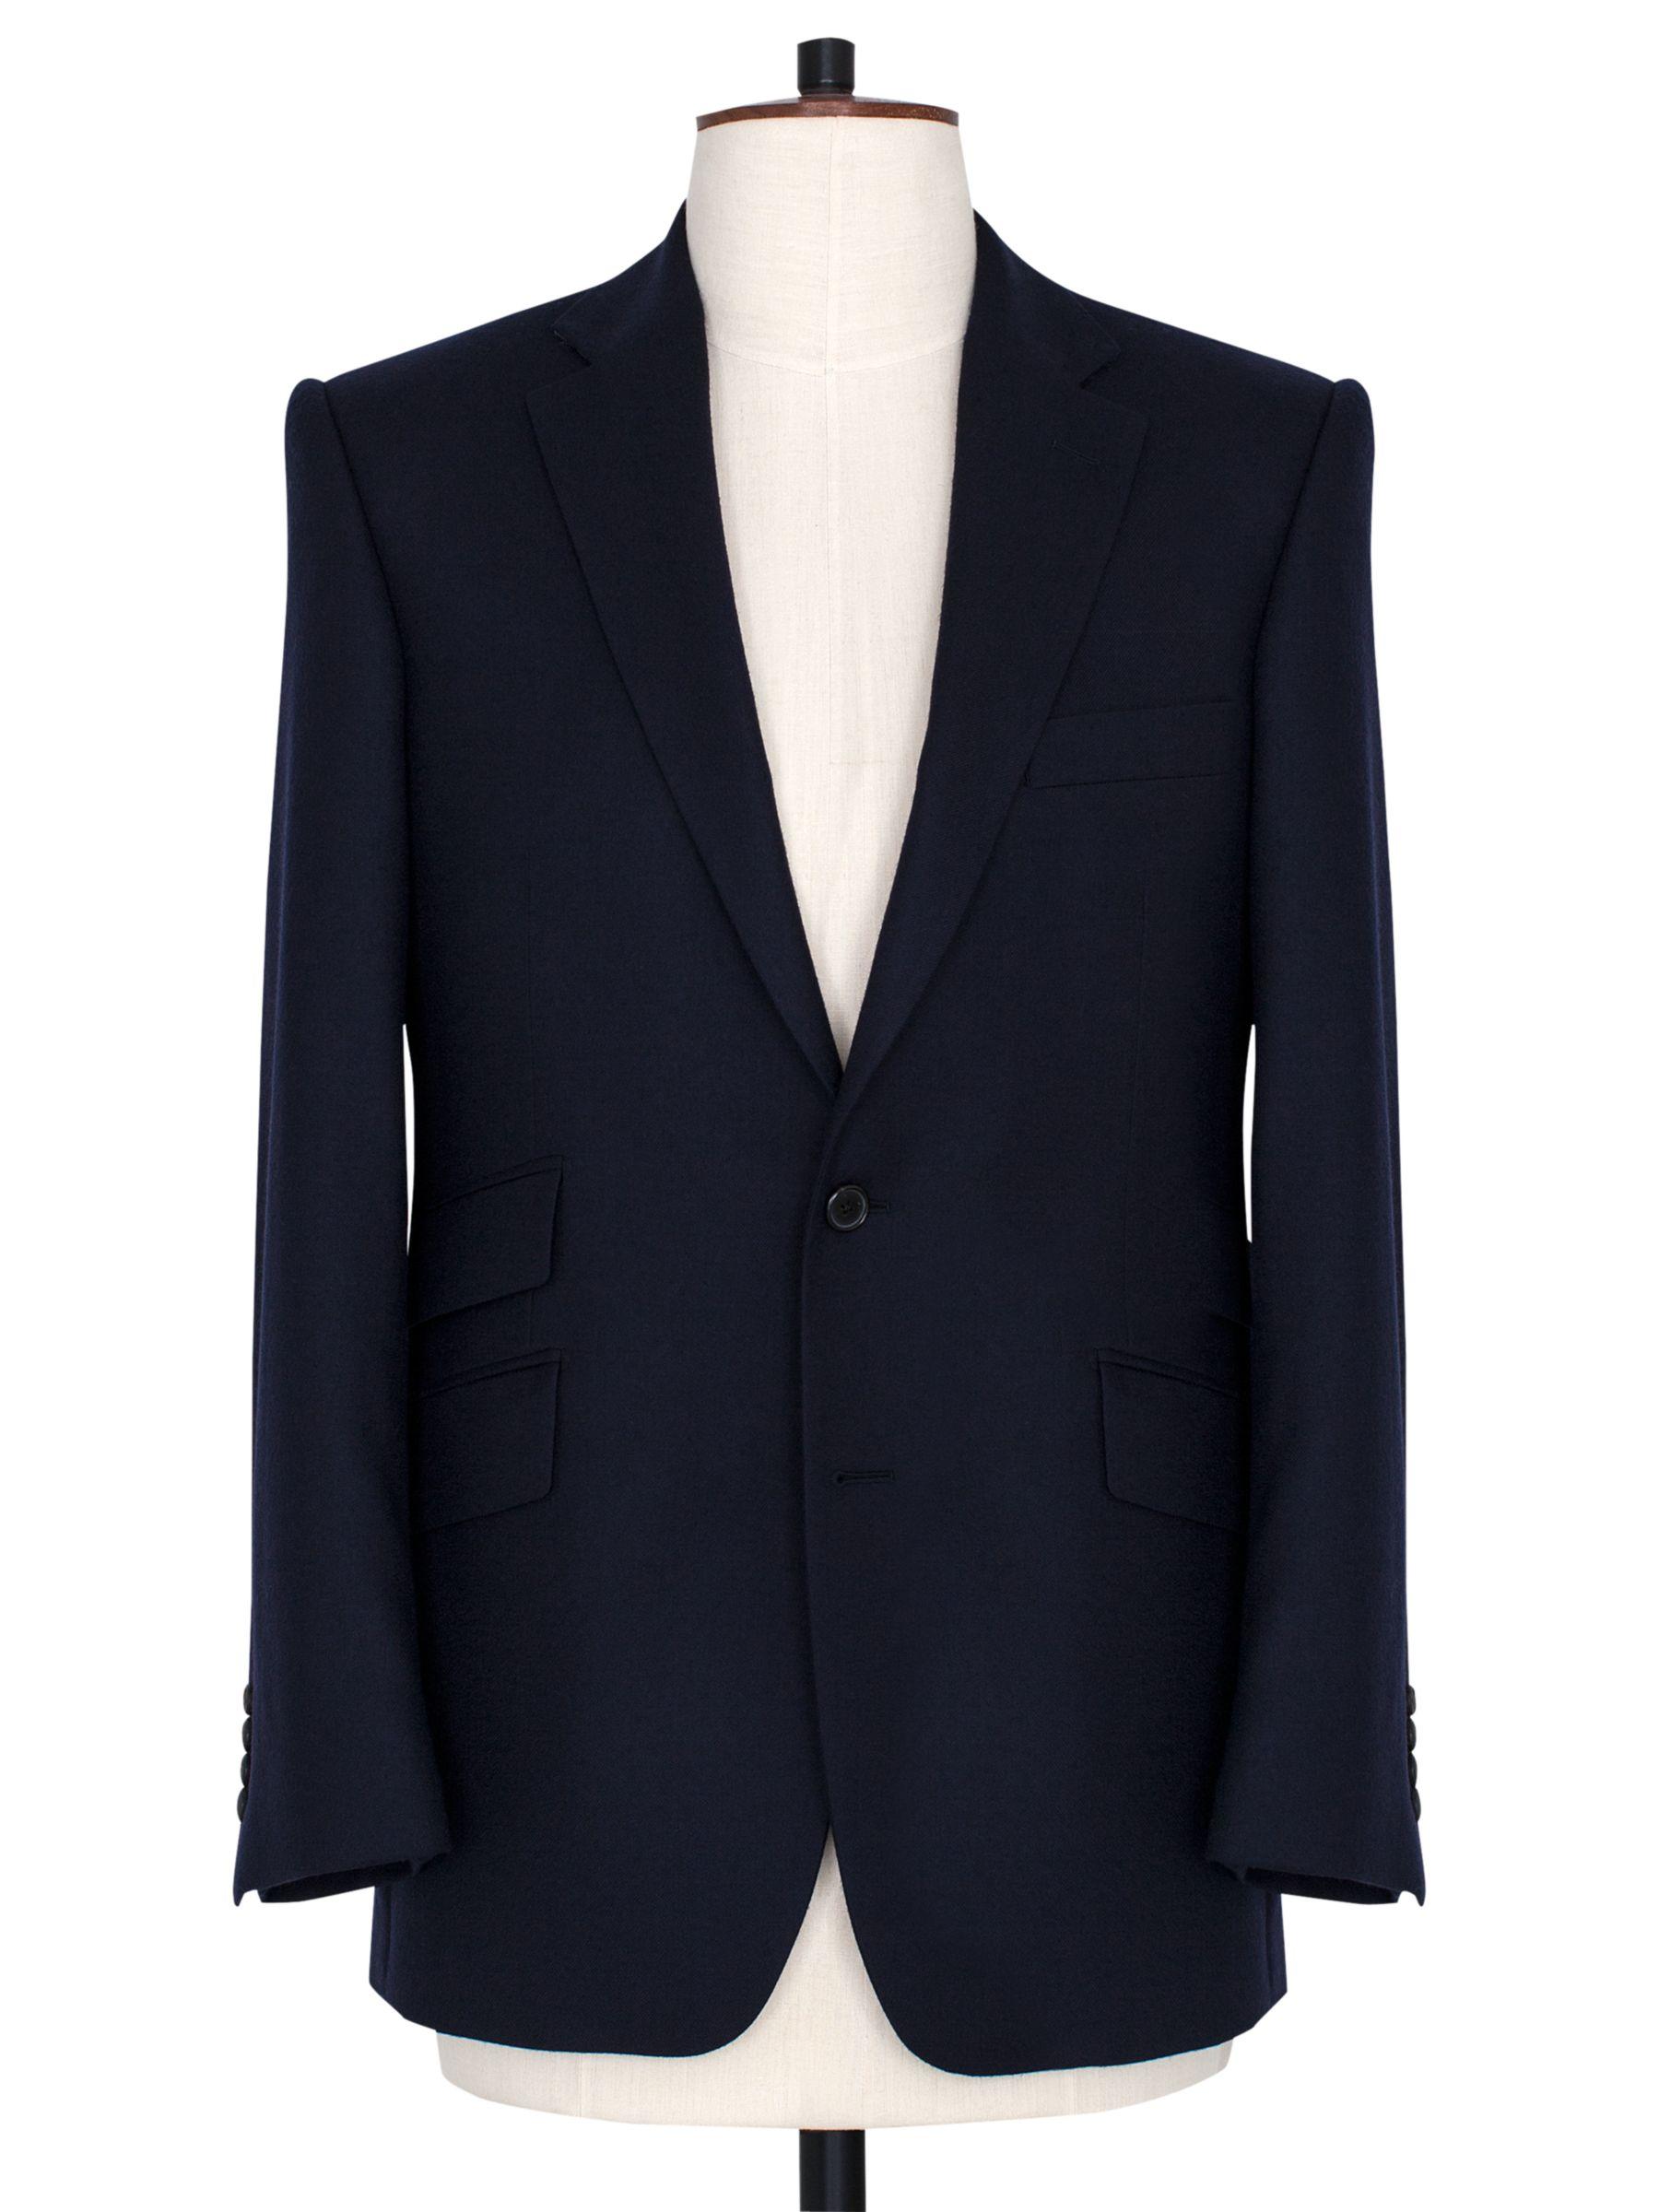 dfd50bfc2fb6 Thomas Pink Blythe Jacket